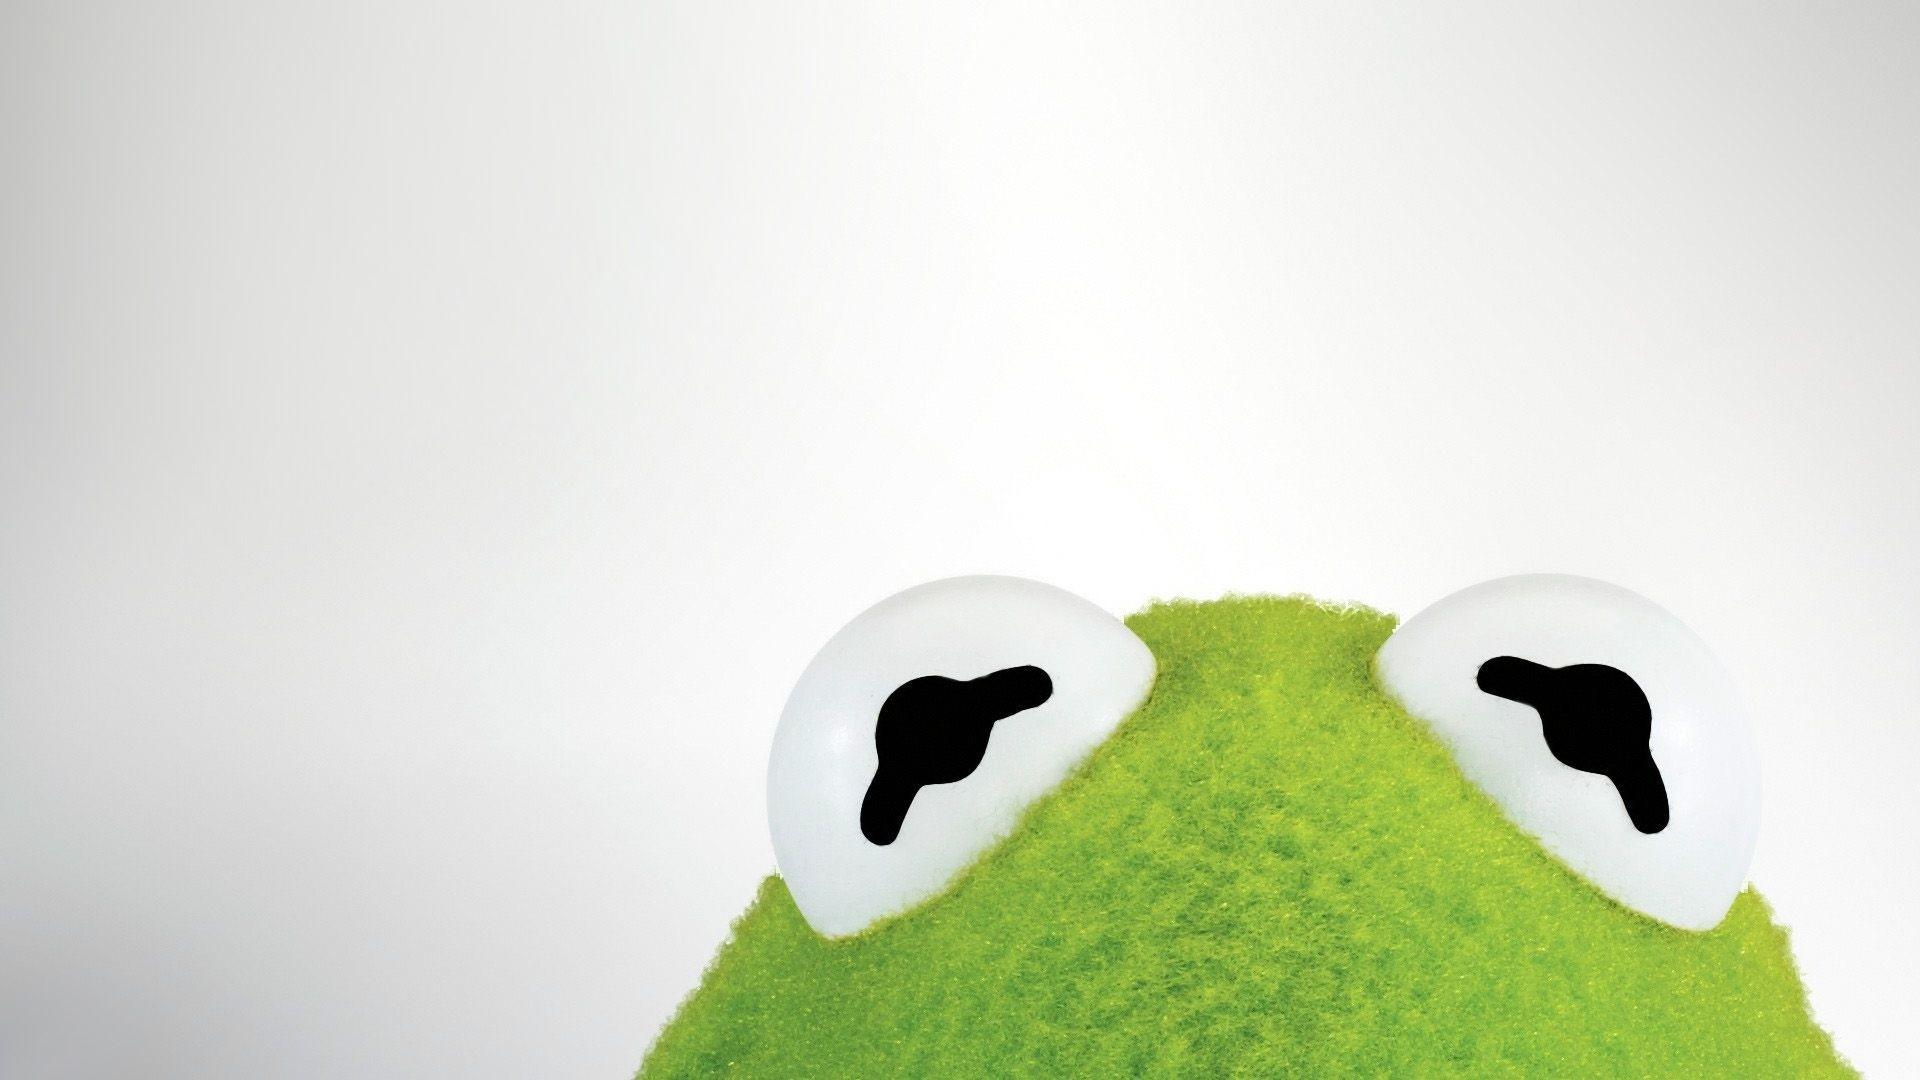 Hearts Kermit The Frog Free Wallpaper